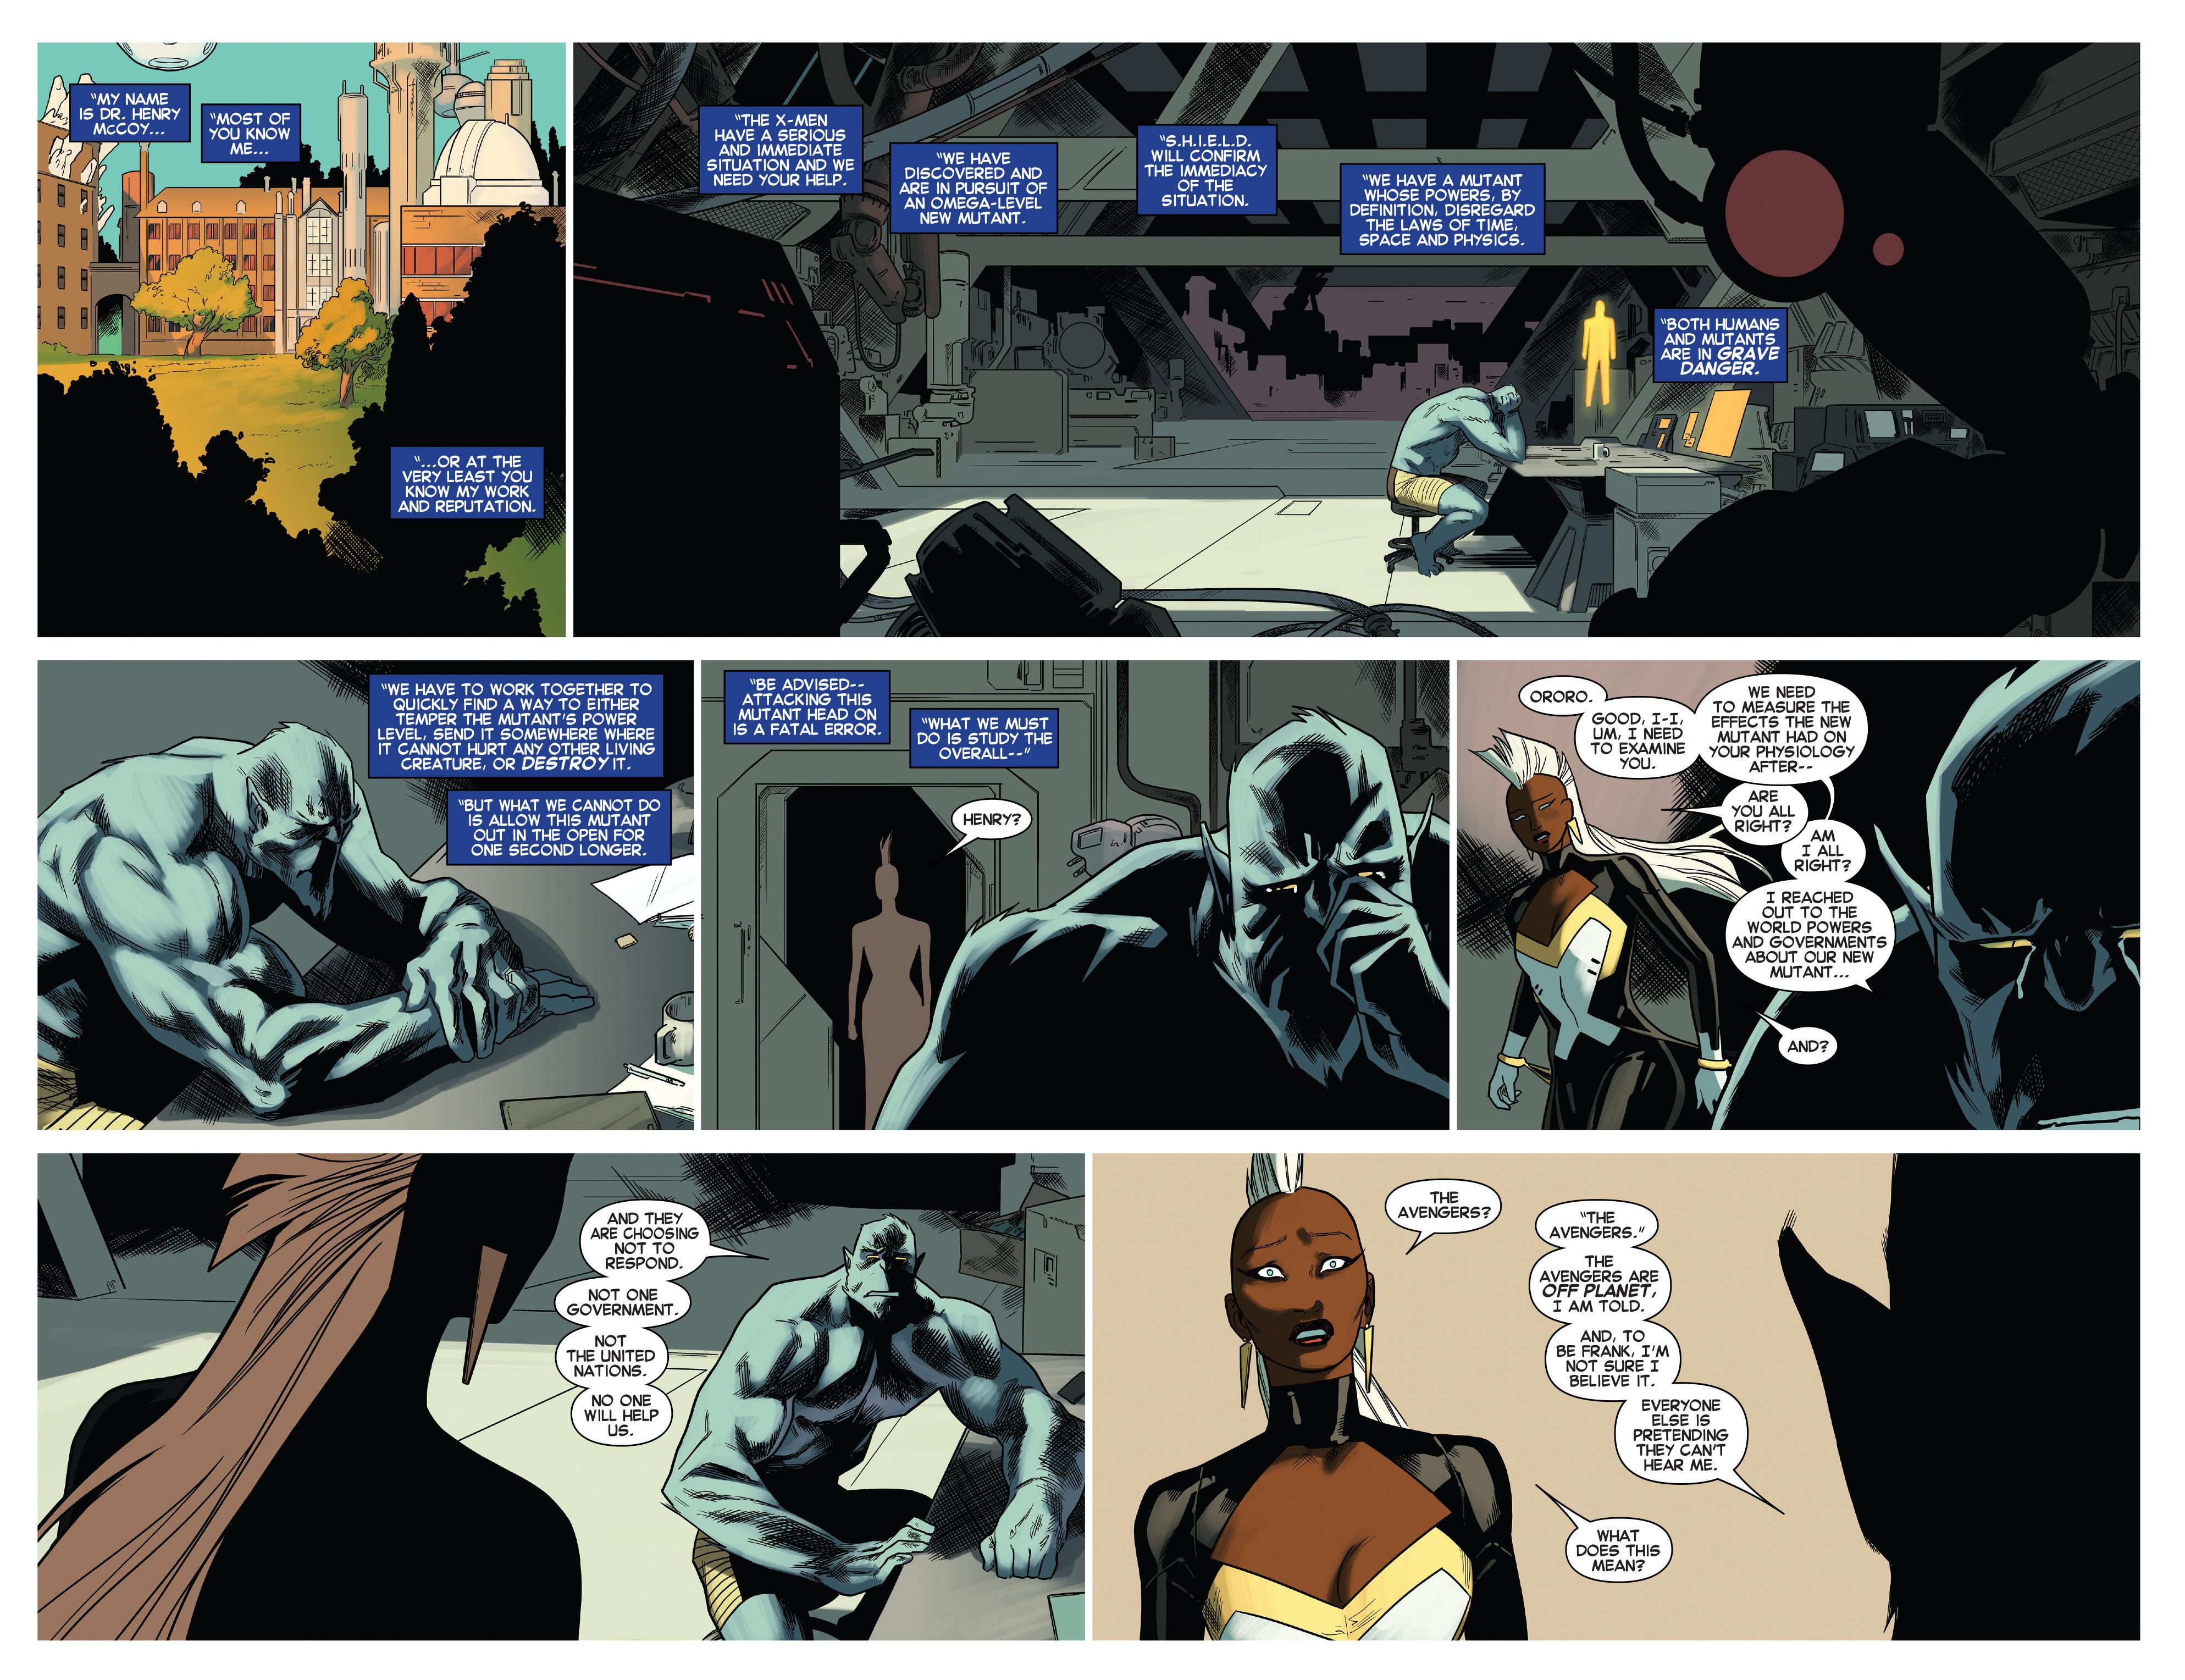 Read online Uncanny X-Men (2013) comic -  Issue # _TPB 5 - The Omega Mutant - 42